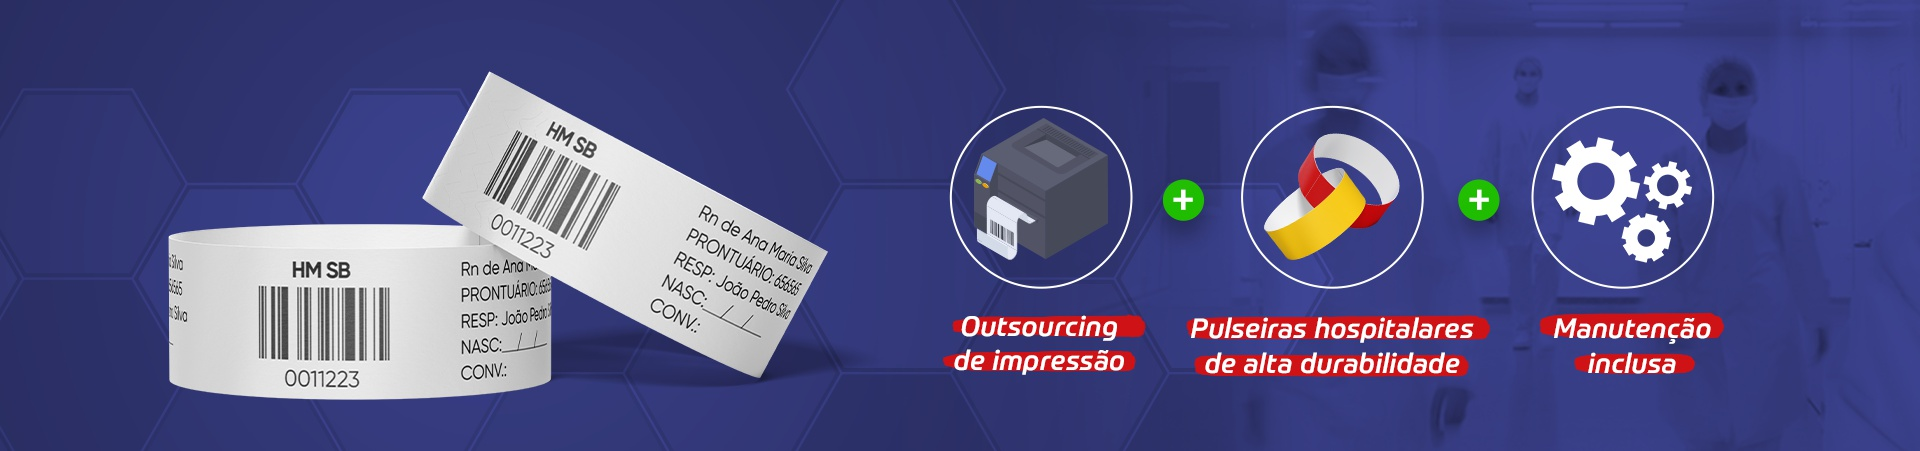 TRSERV - Pulseiras Hospitalares - banner interno